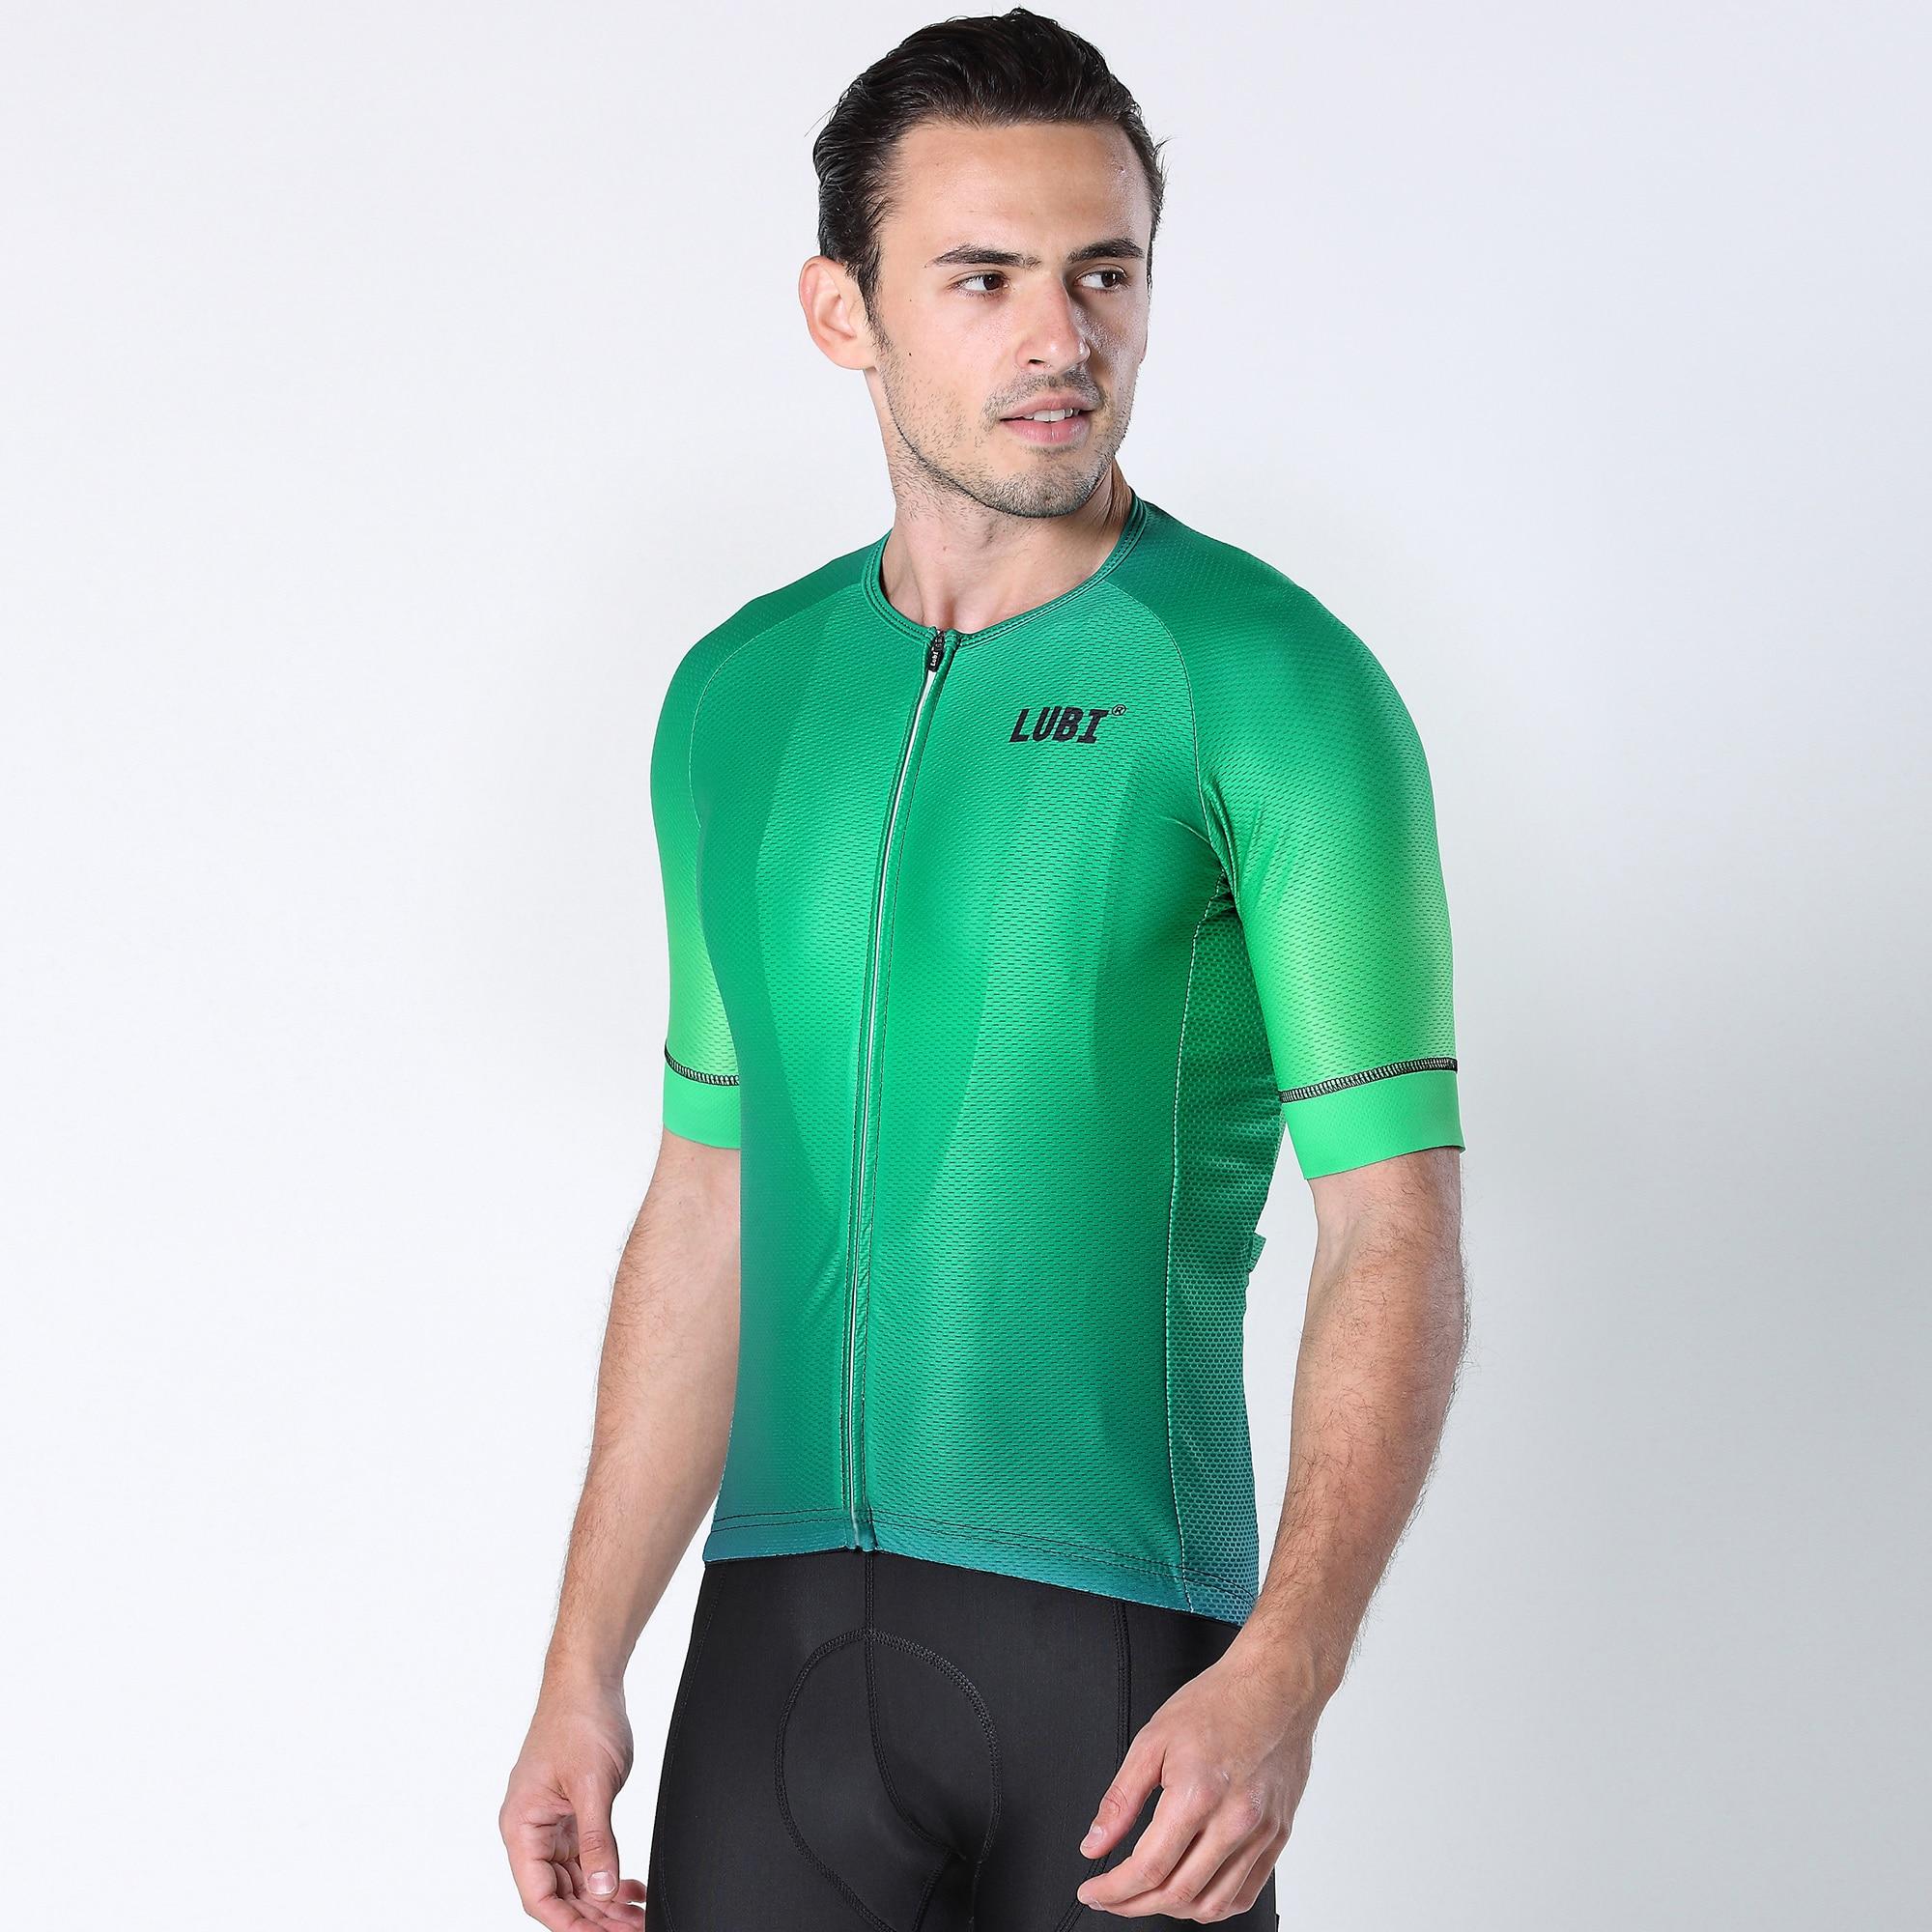 Lubi 2020 Mannen Zomer Wielertrui Pro Team Mountainbike Kleding Racing Mtb Fiets Kleding Shirt Fietsen Kleding Uniform-in Fietstruien van sport & Entertainment op LuBi Official Store